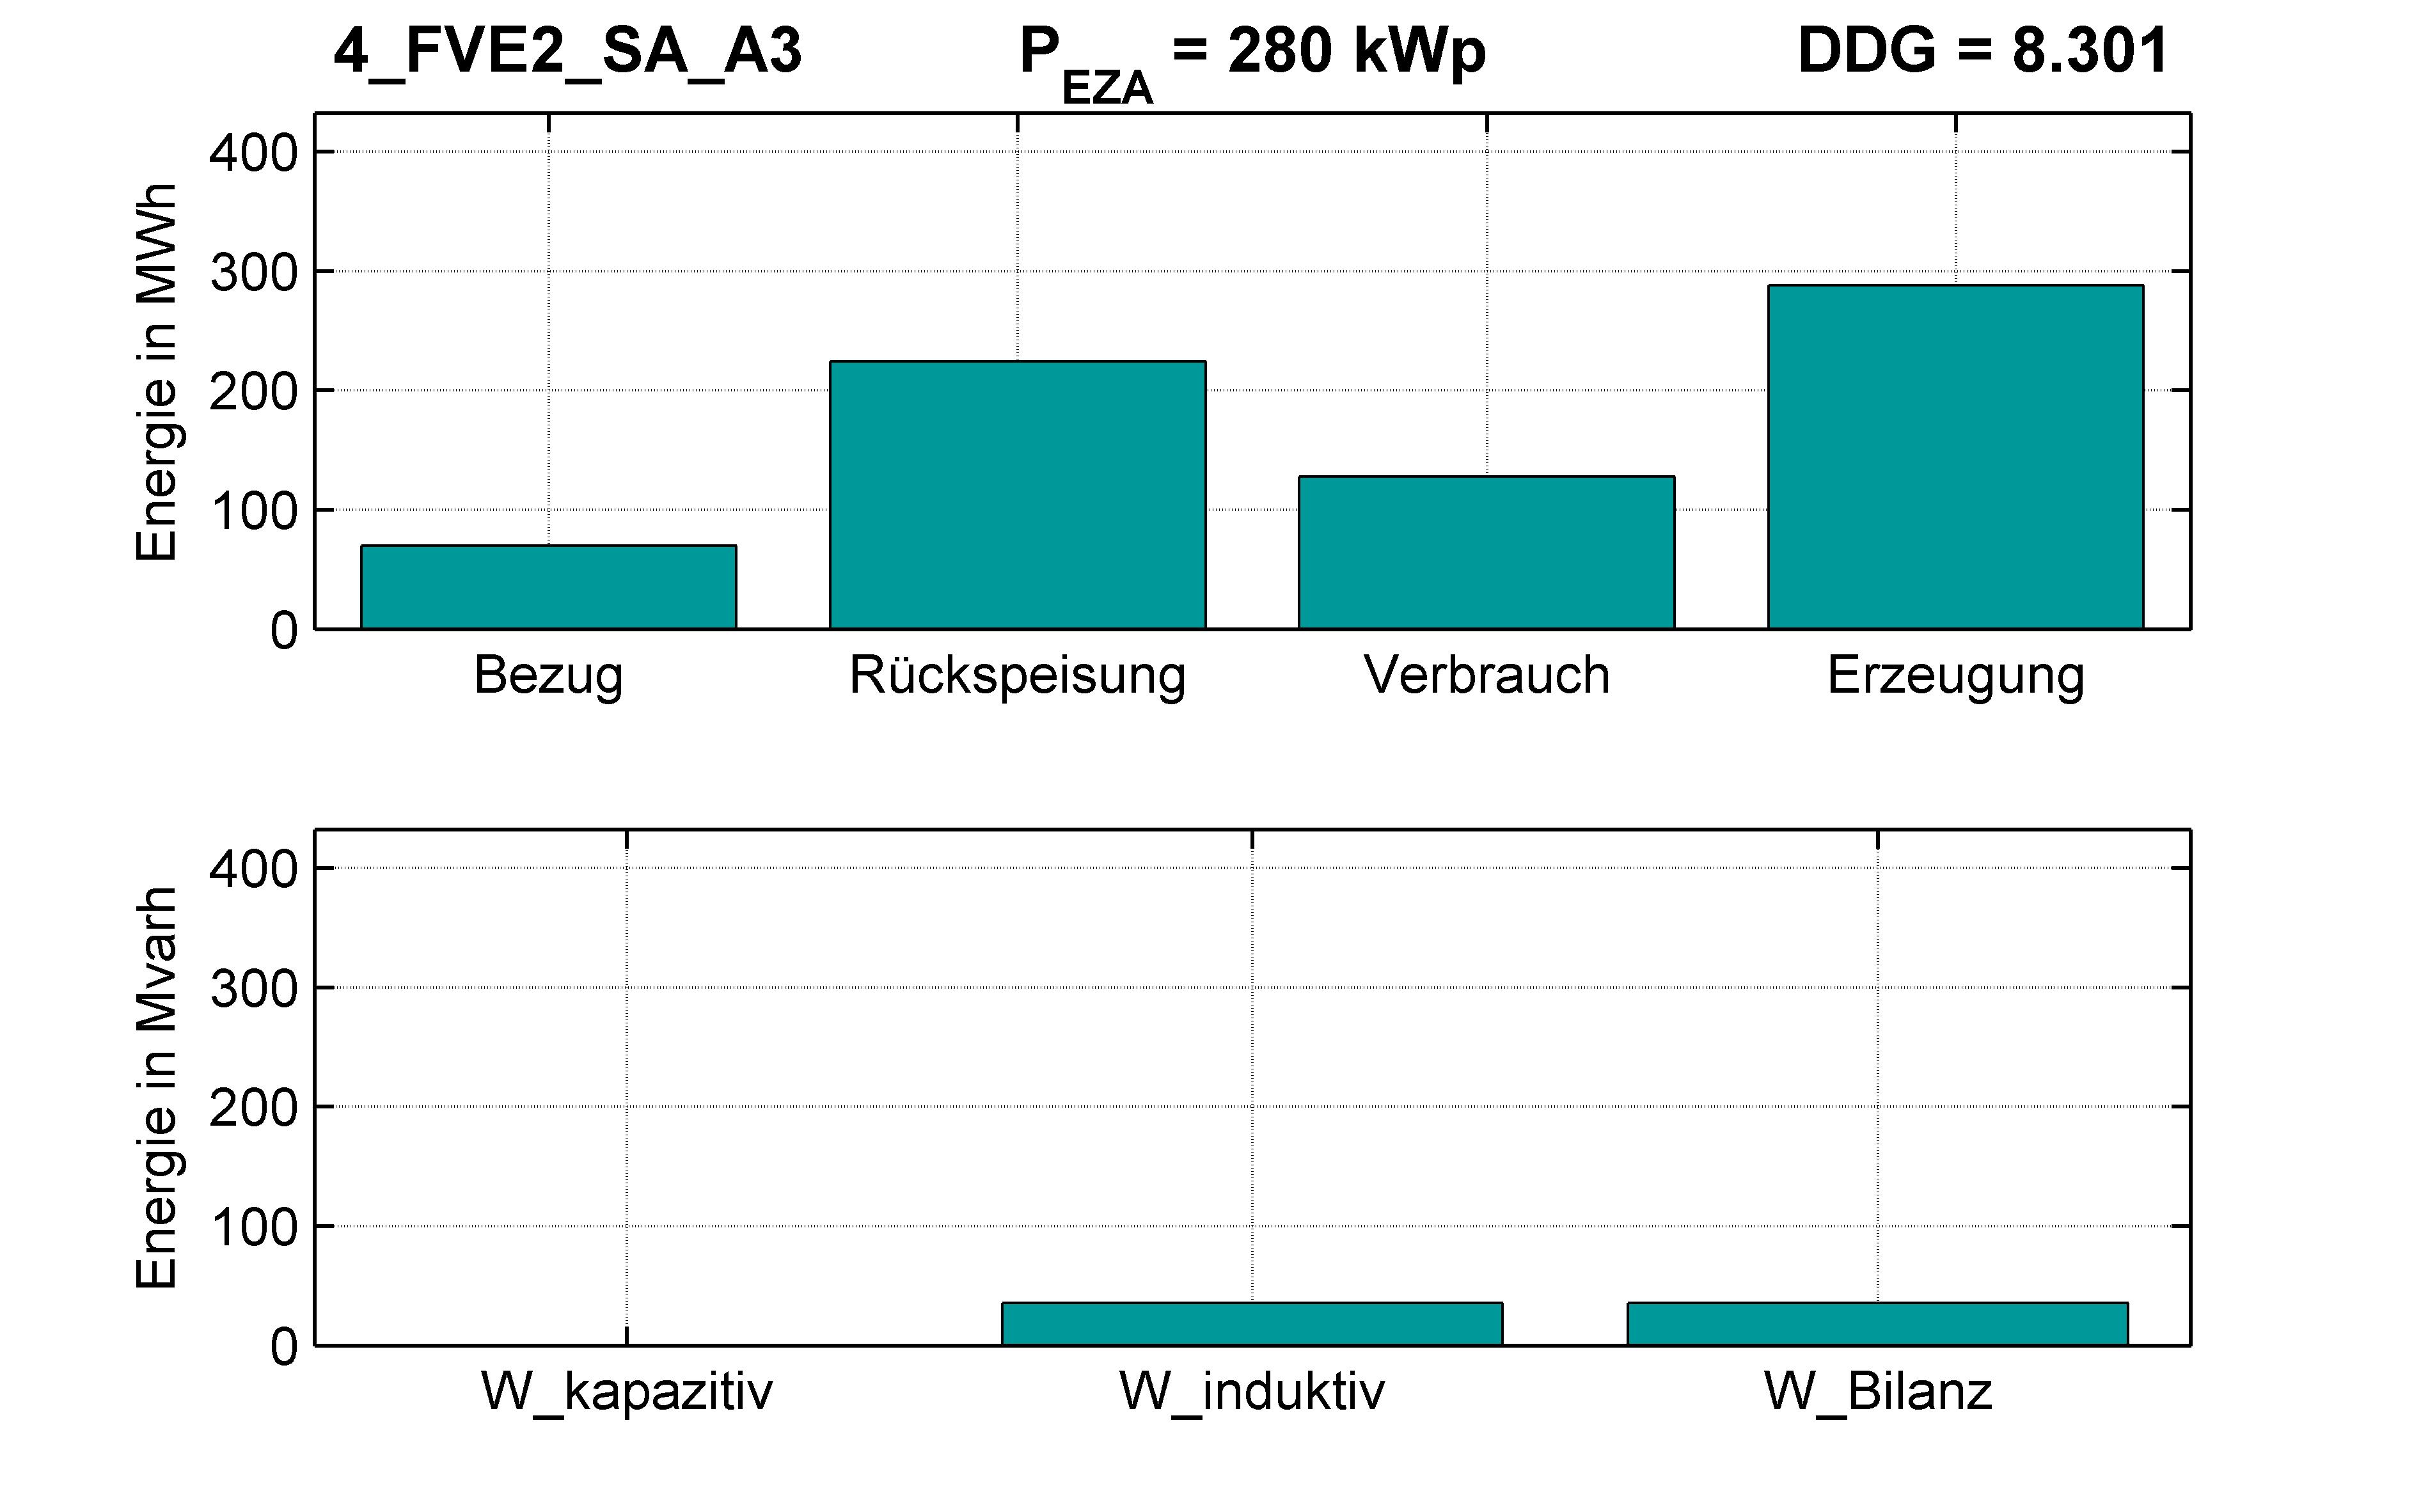 FVE2 | P-Kappung 55% (SA) A3 | PQ-Bilanz